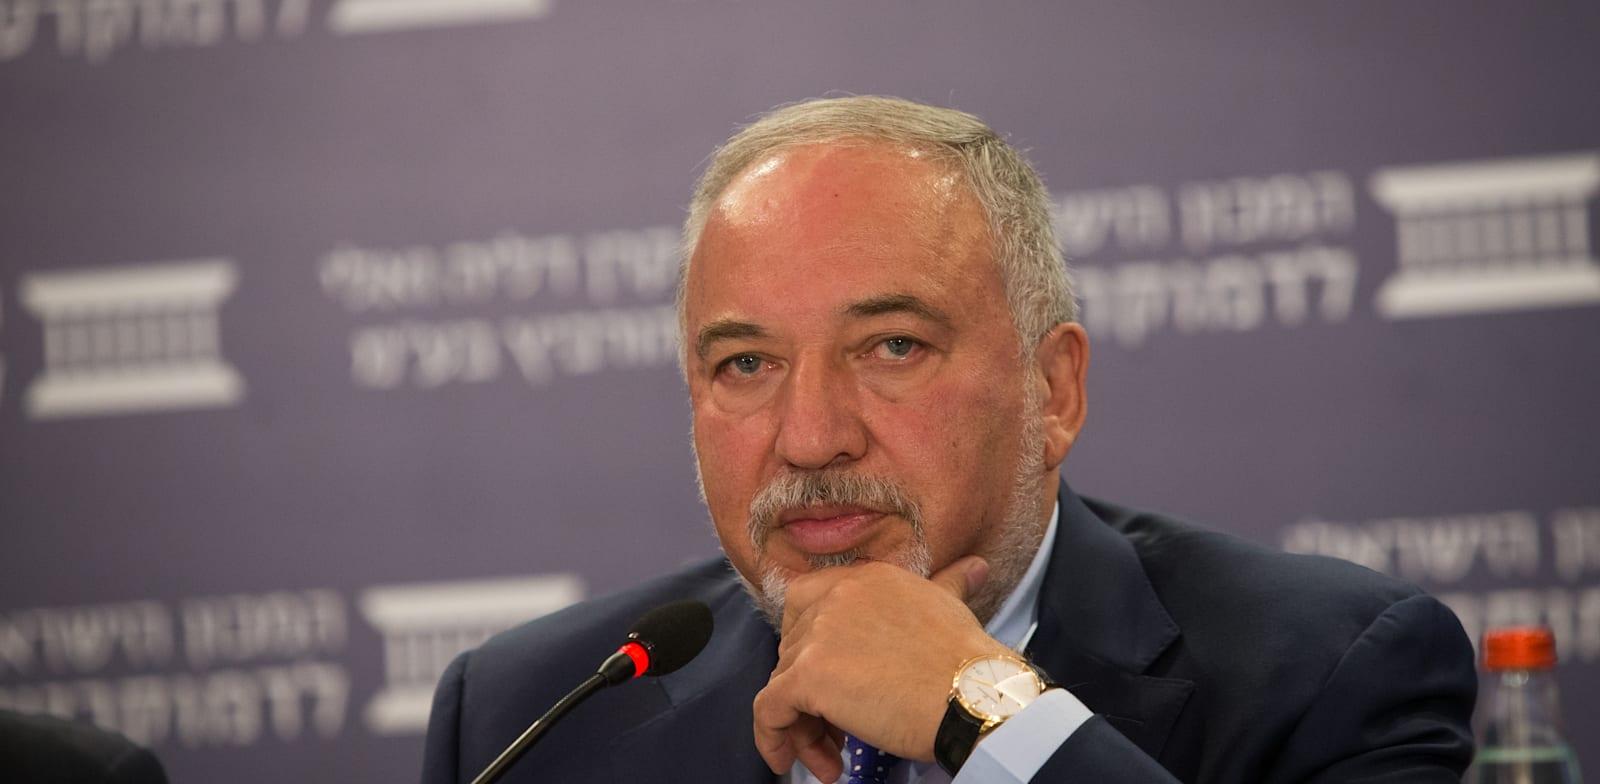 Avigdor Liberman Photo: Israel Institute of Democracy